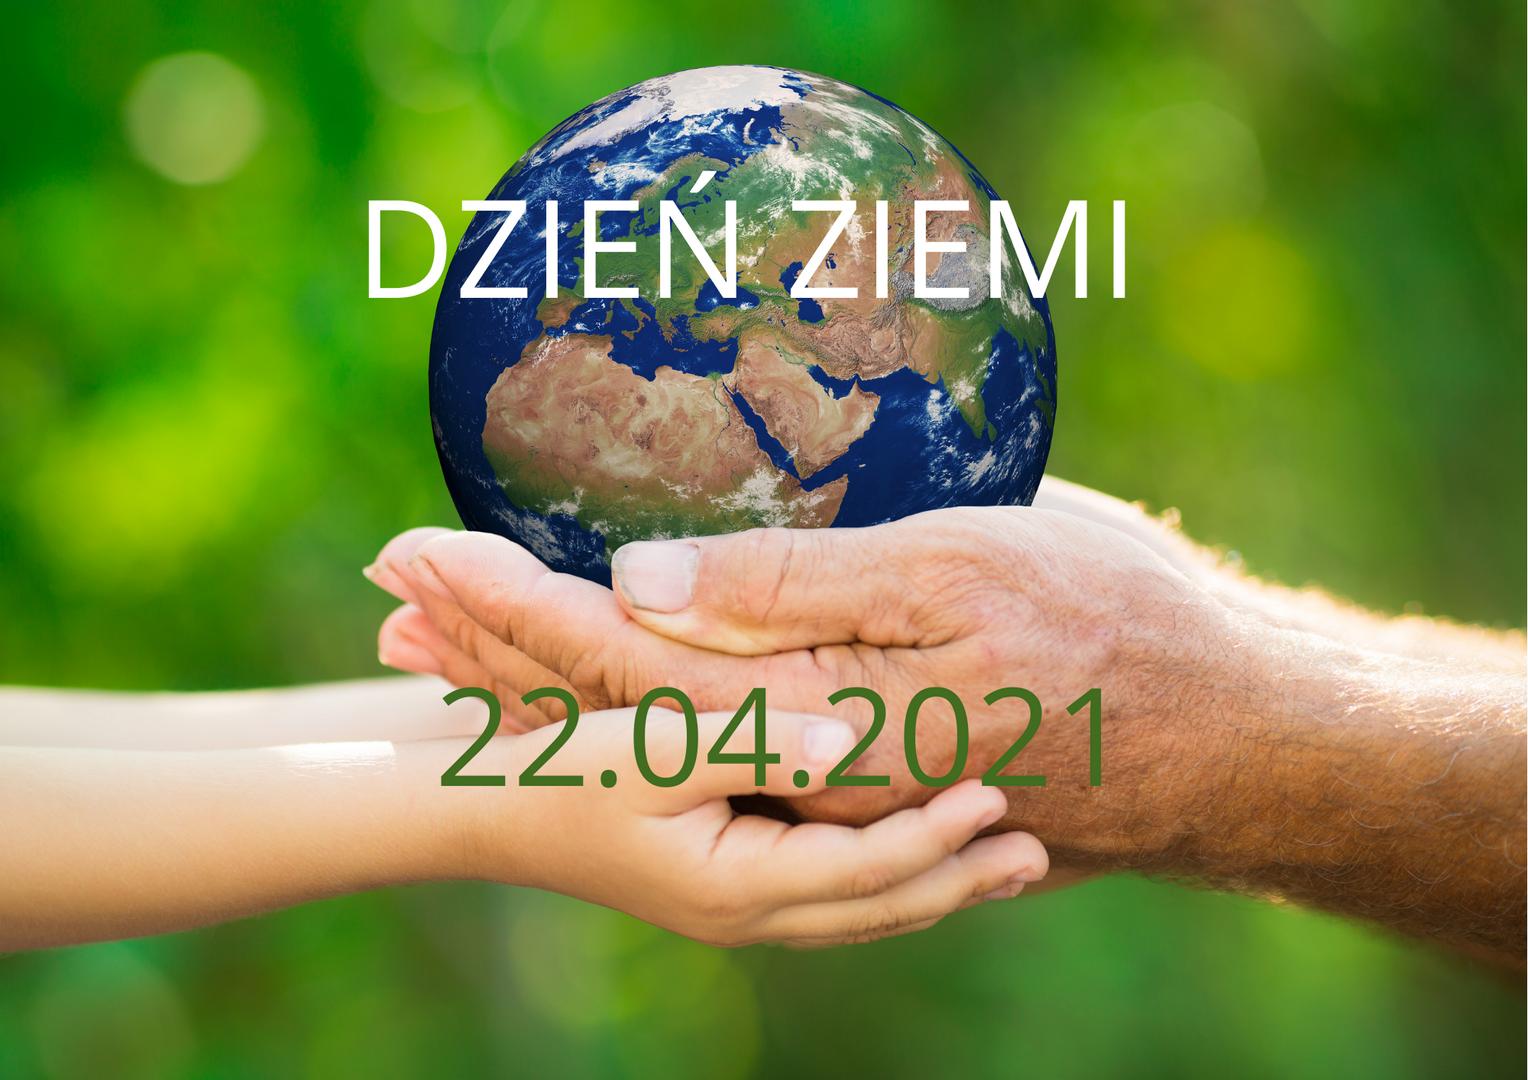 Dzień Ziemi - 22.04.2021 (Dooble)